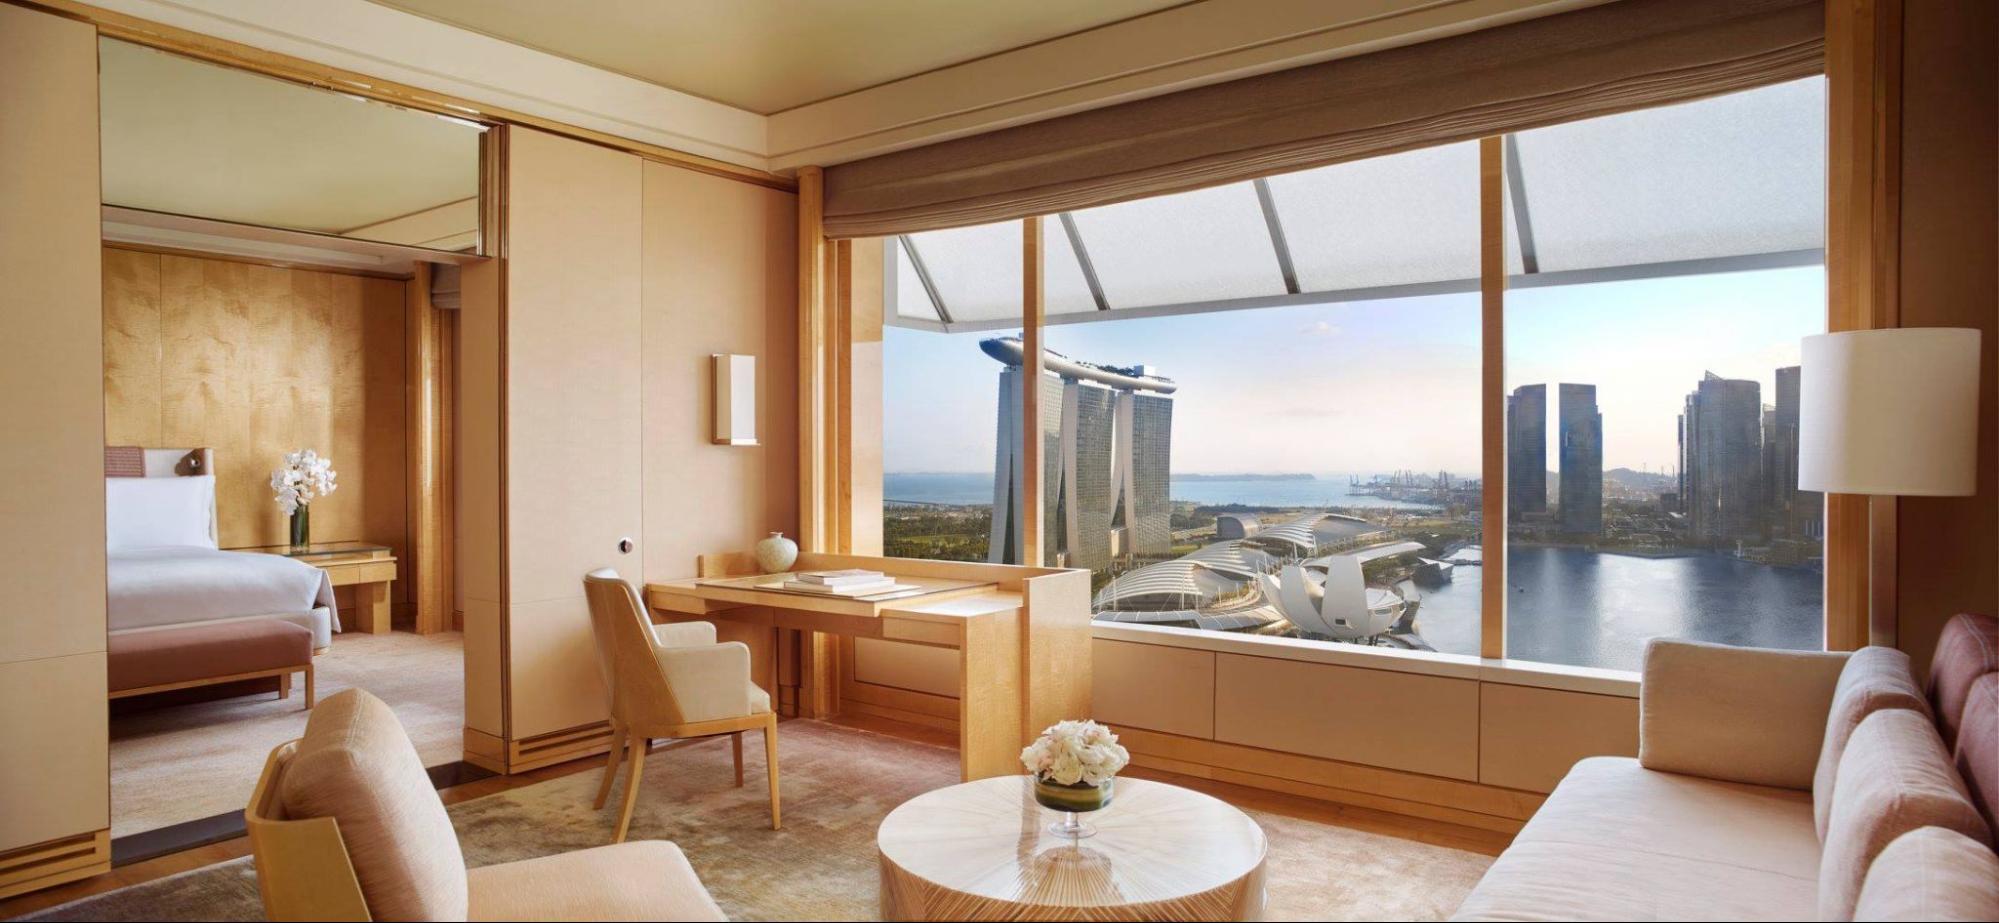 ritz carlton singapore accessible hotels